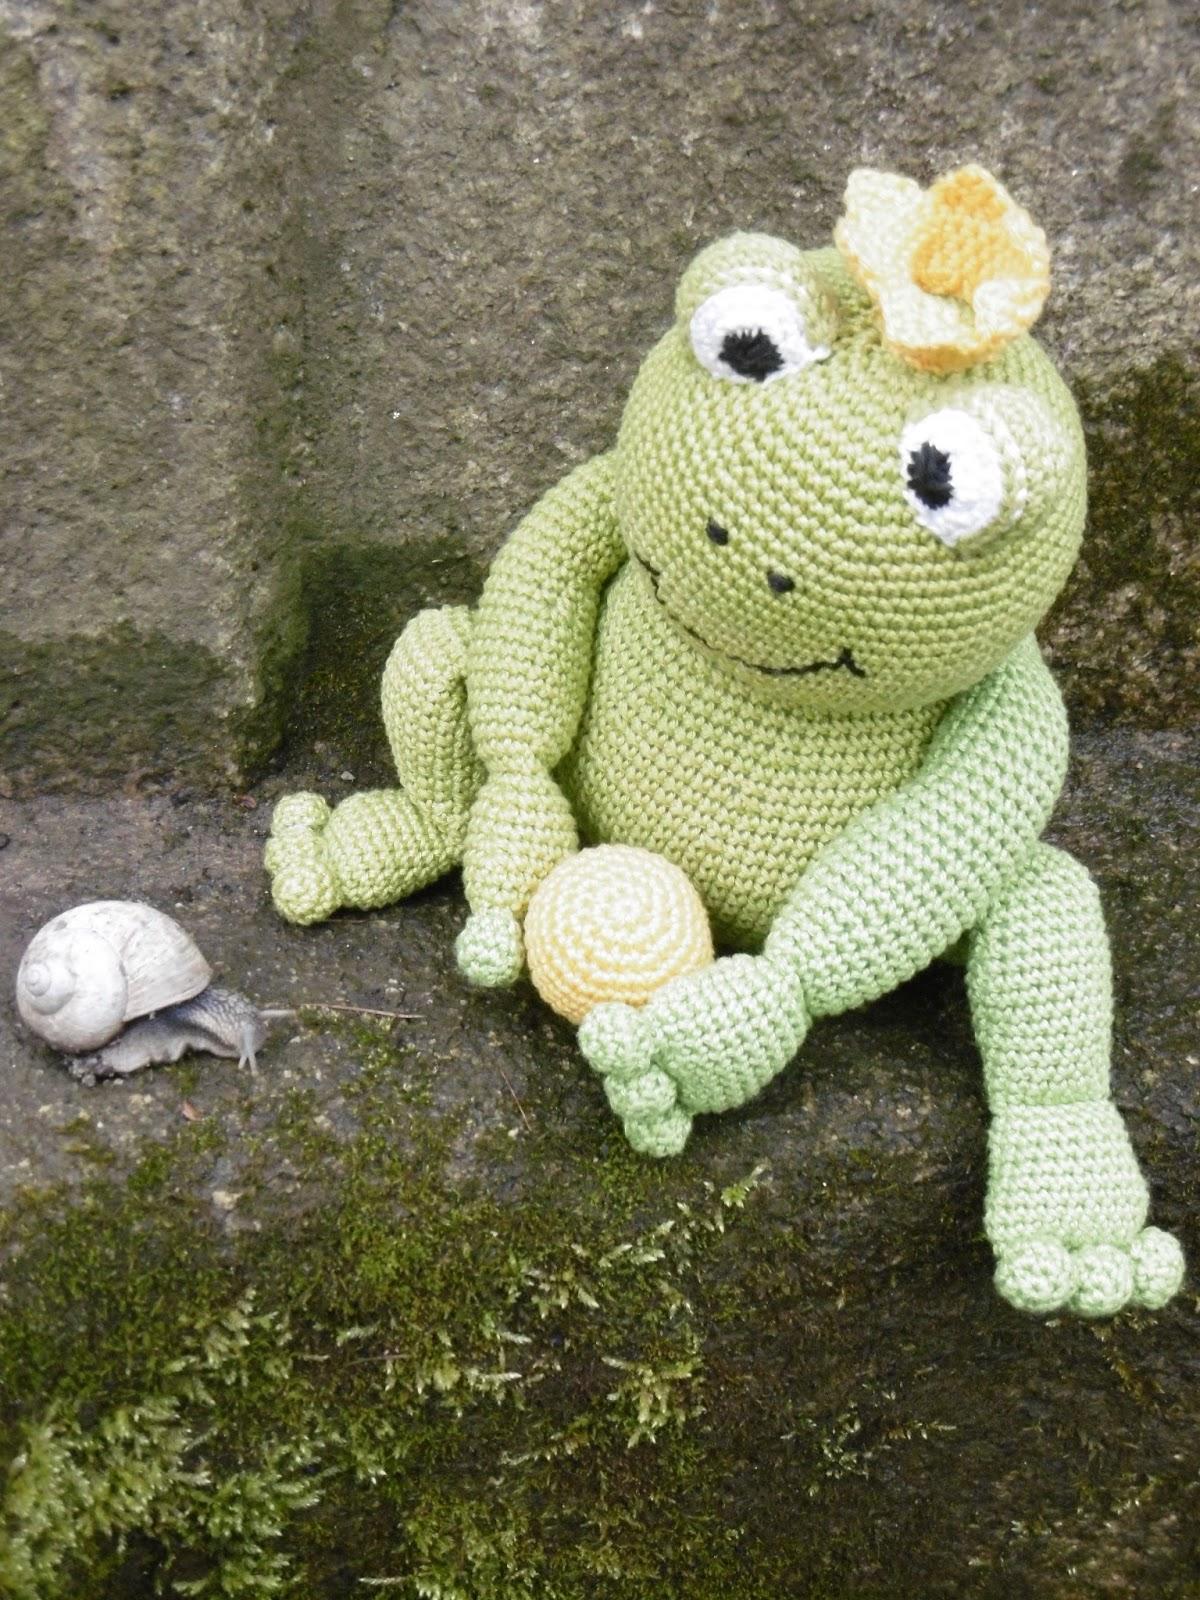 Fritz the Frog amigurumi pattern - Amigurumipatterns.net | 1600x1200